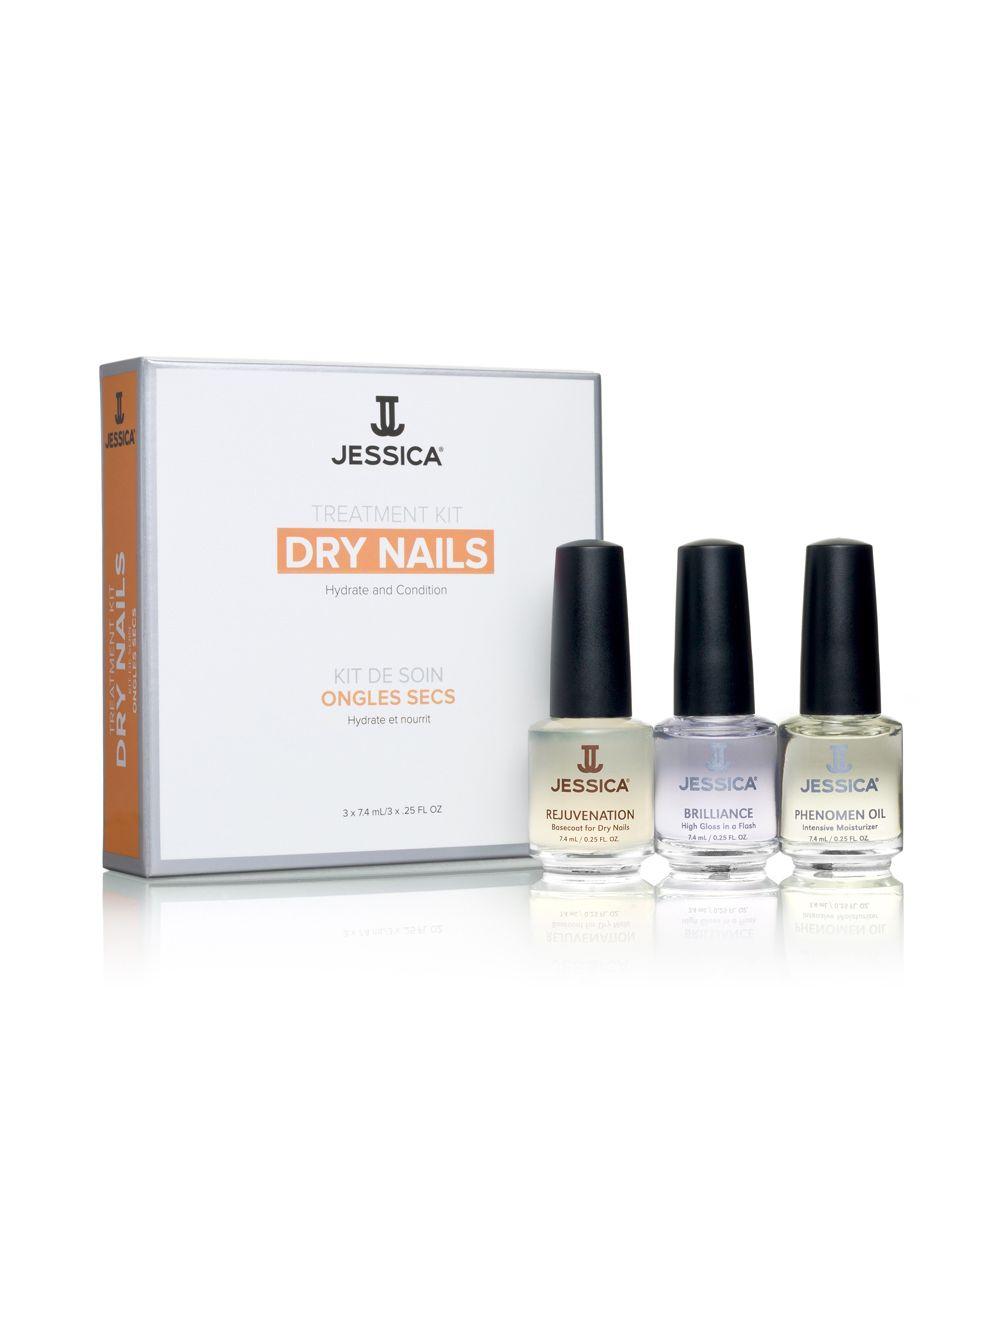 Jessica Cosmetics Treatment Kit Dry Nails 2